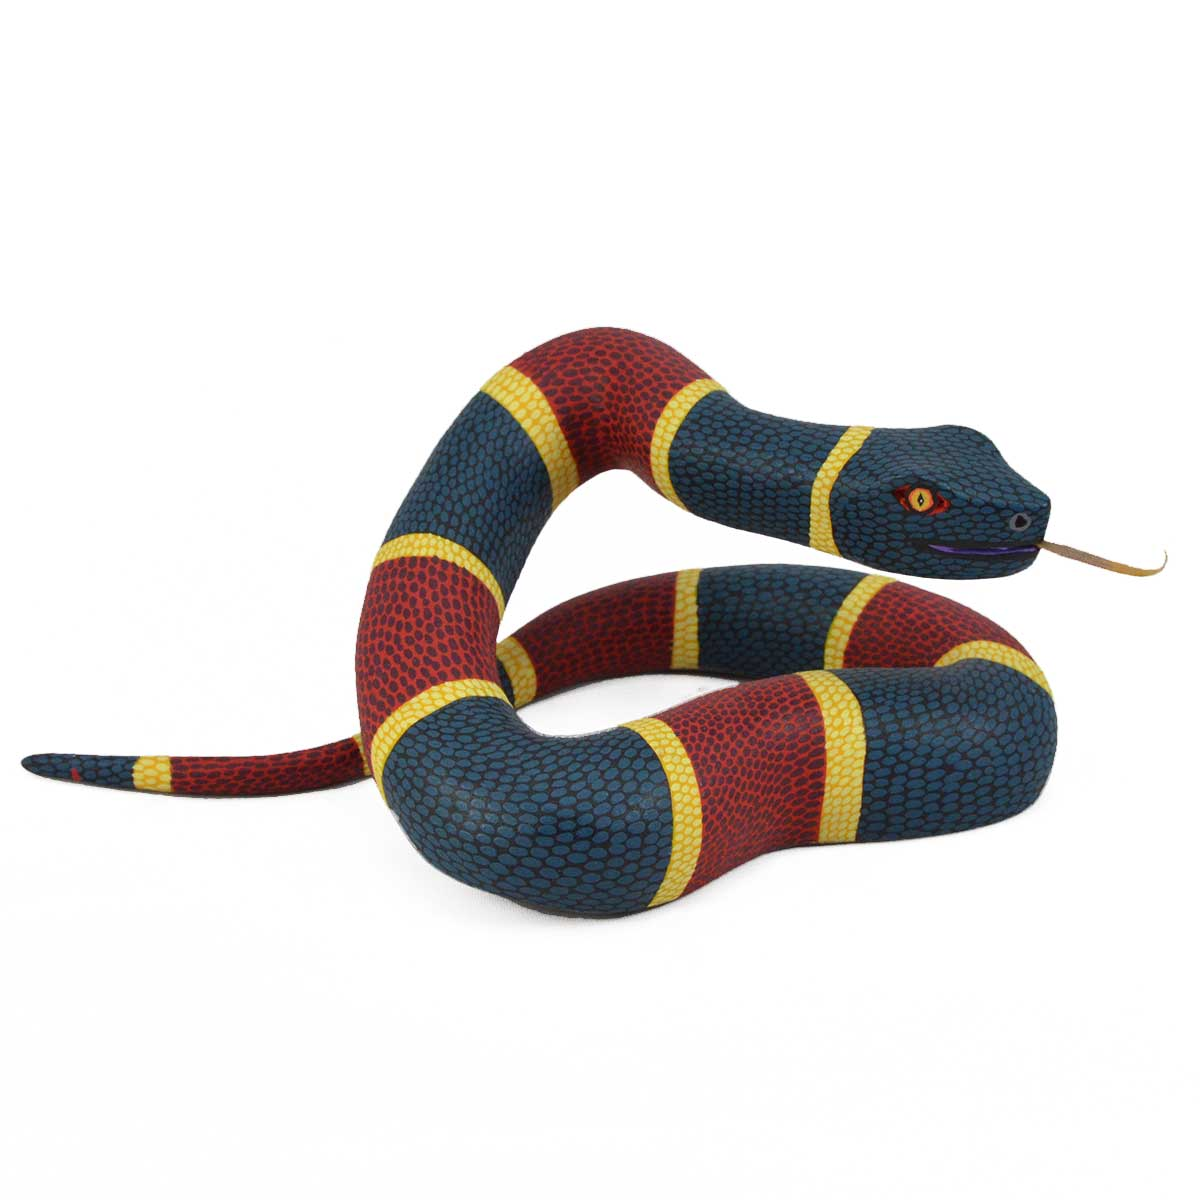 Eleazar Morales: Coral Snake